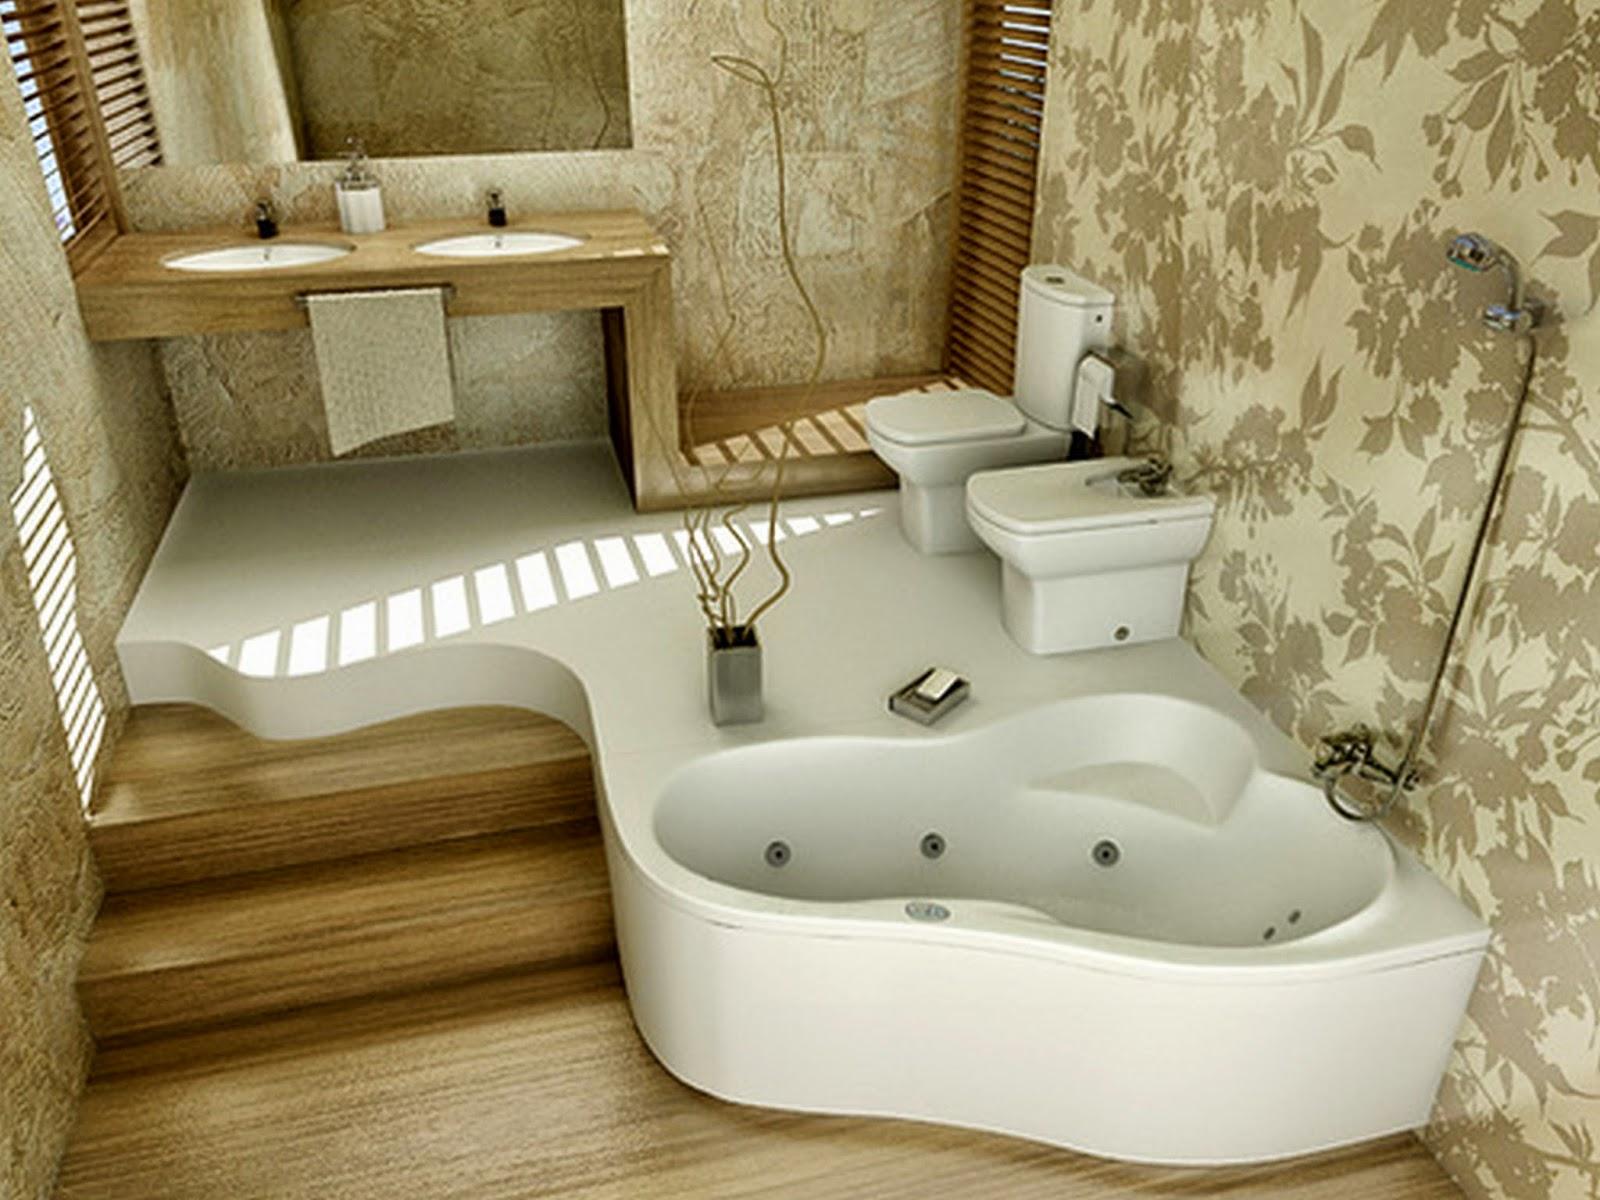 Modern Wallpaper Ideas for Bathroom